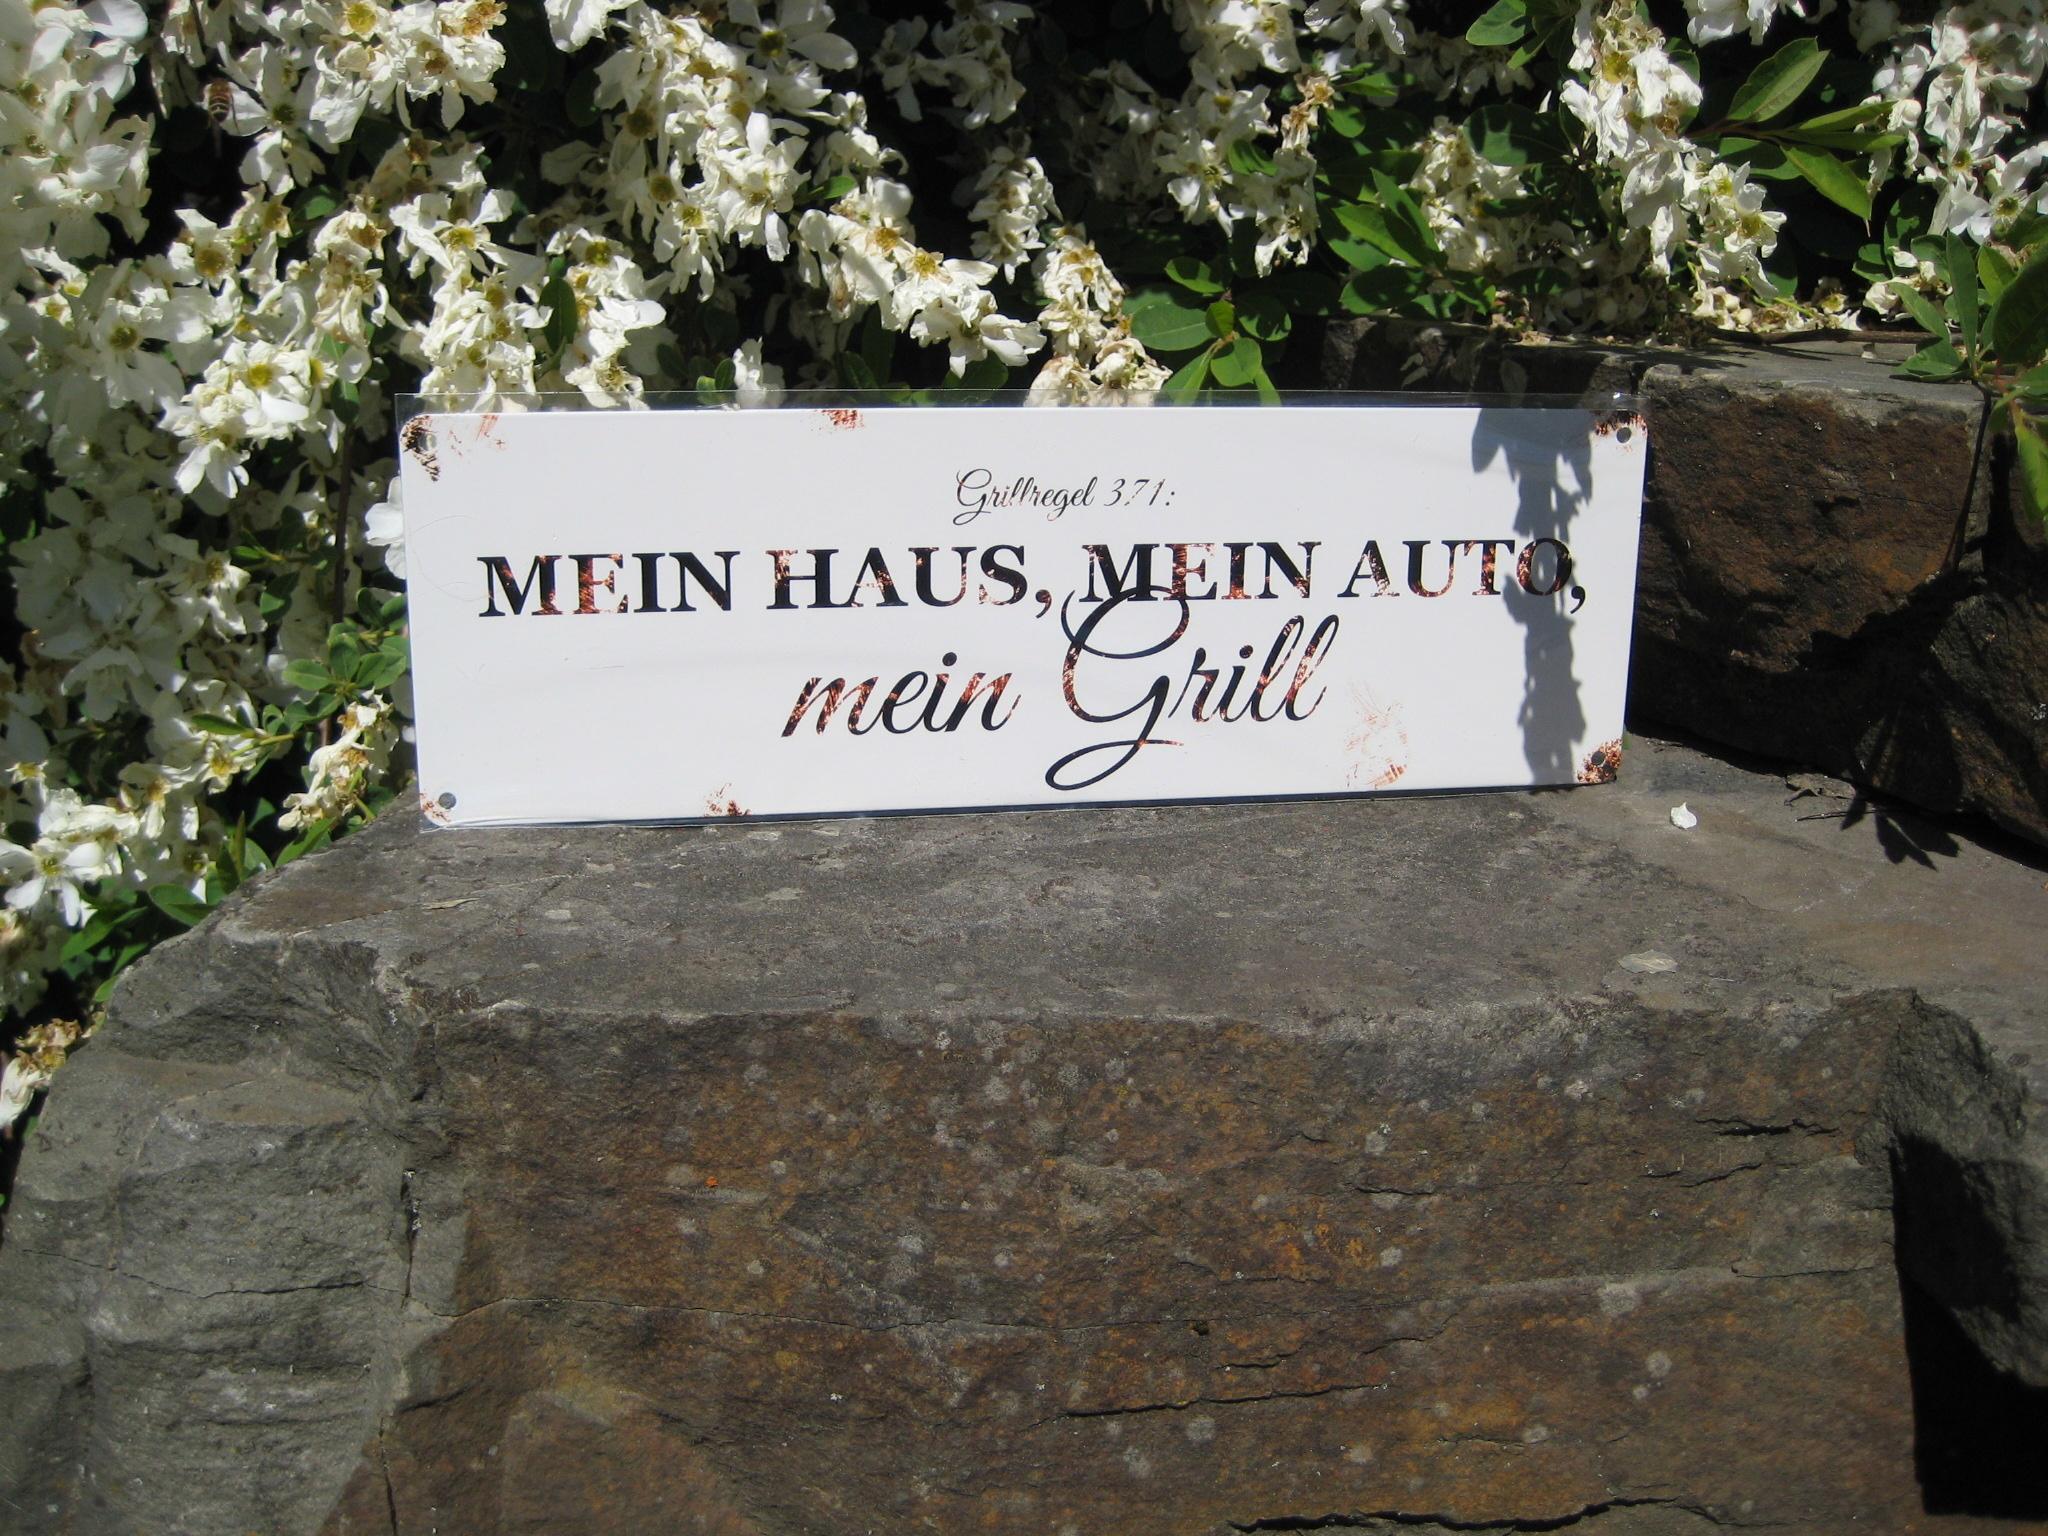 Metallschild: Grillregel 371